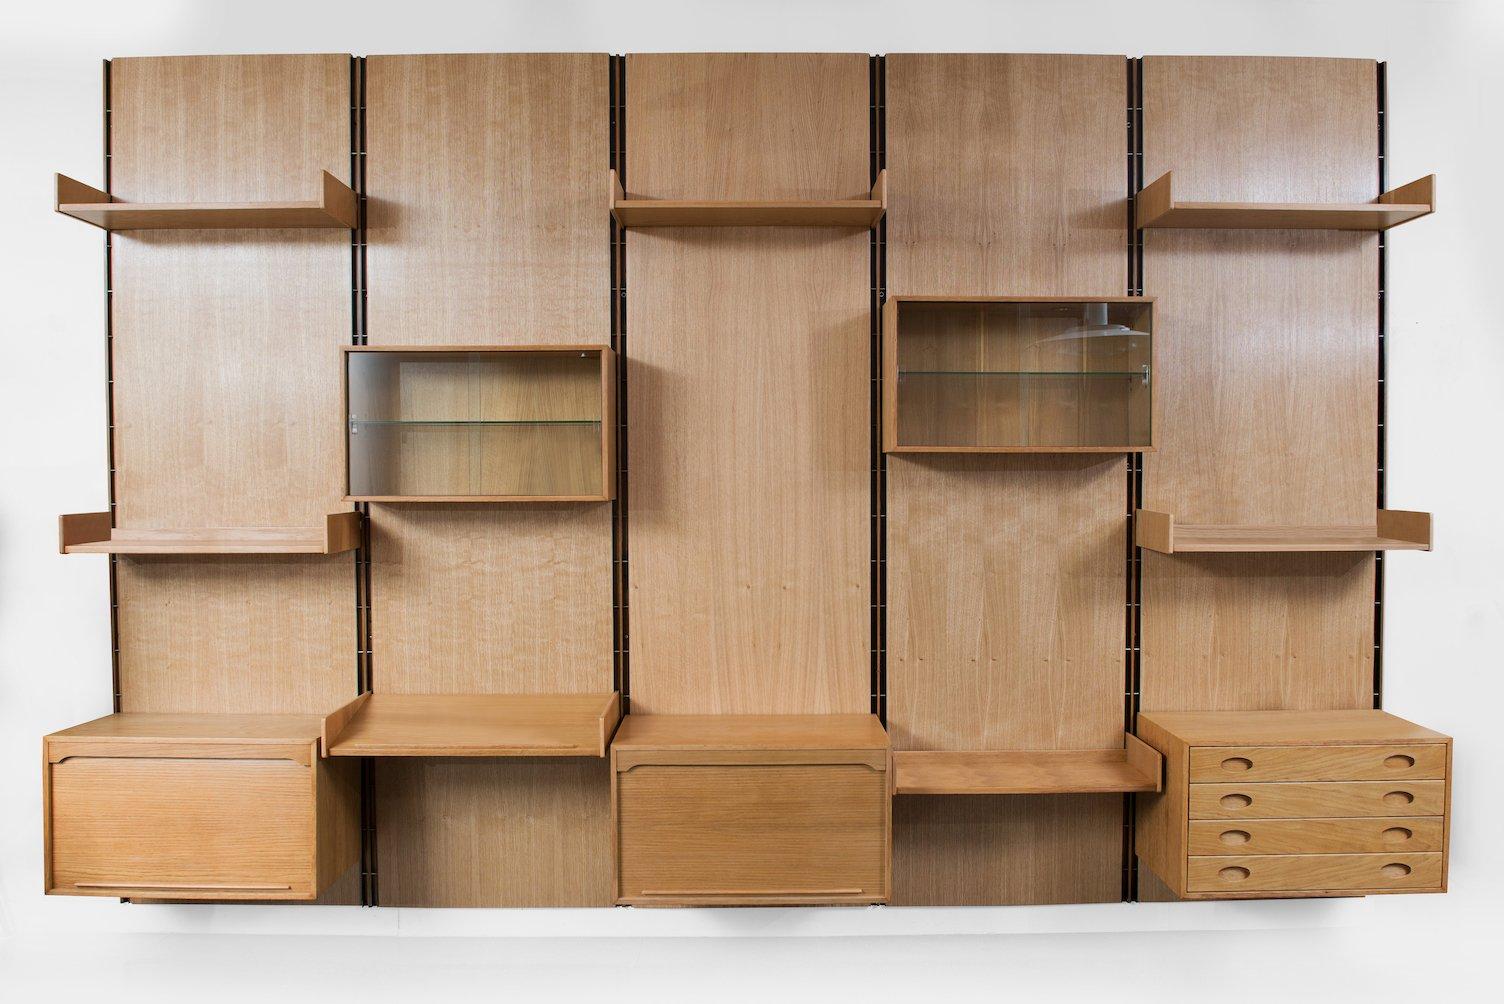 gro es eichenholz regal von gianfranco frattini f r bernini 1950er bei pamono kaufen. Black Bedroom Furniture Sets. Home Design Ideas